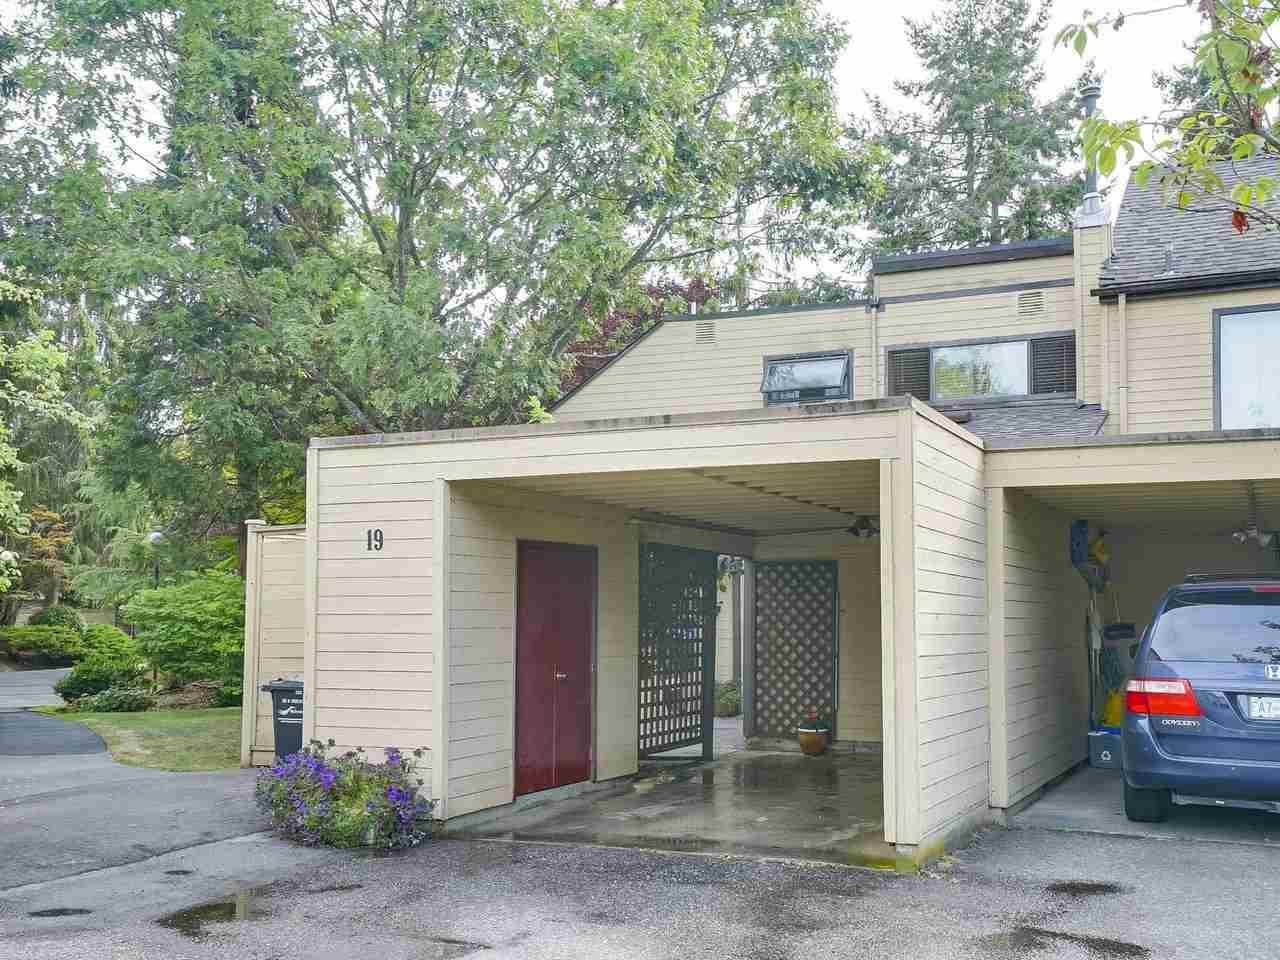 Townhouse at 19 7491 NO. 1 ROAD, Unit 19, Richmond, British Columbia. Image 1